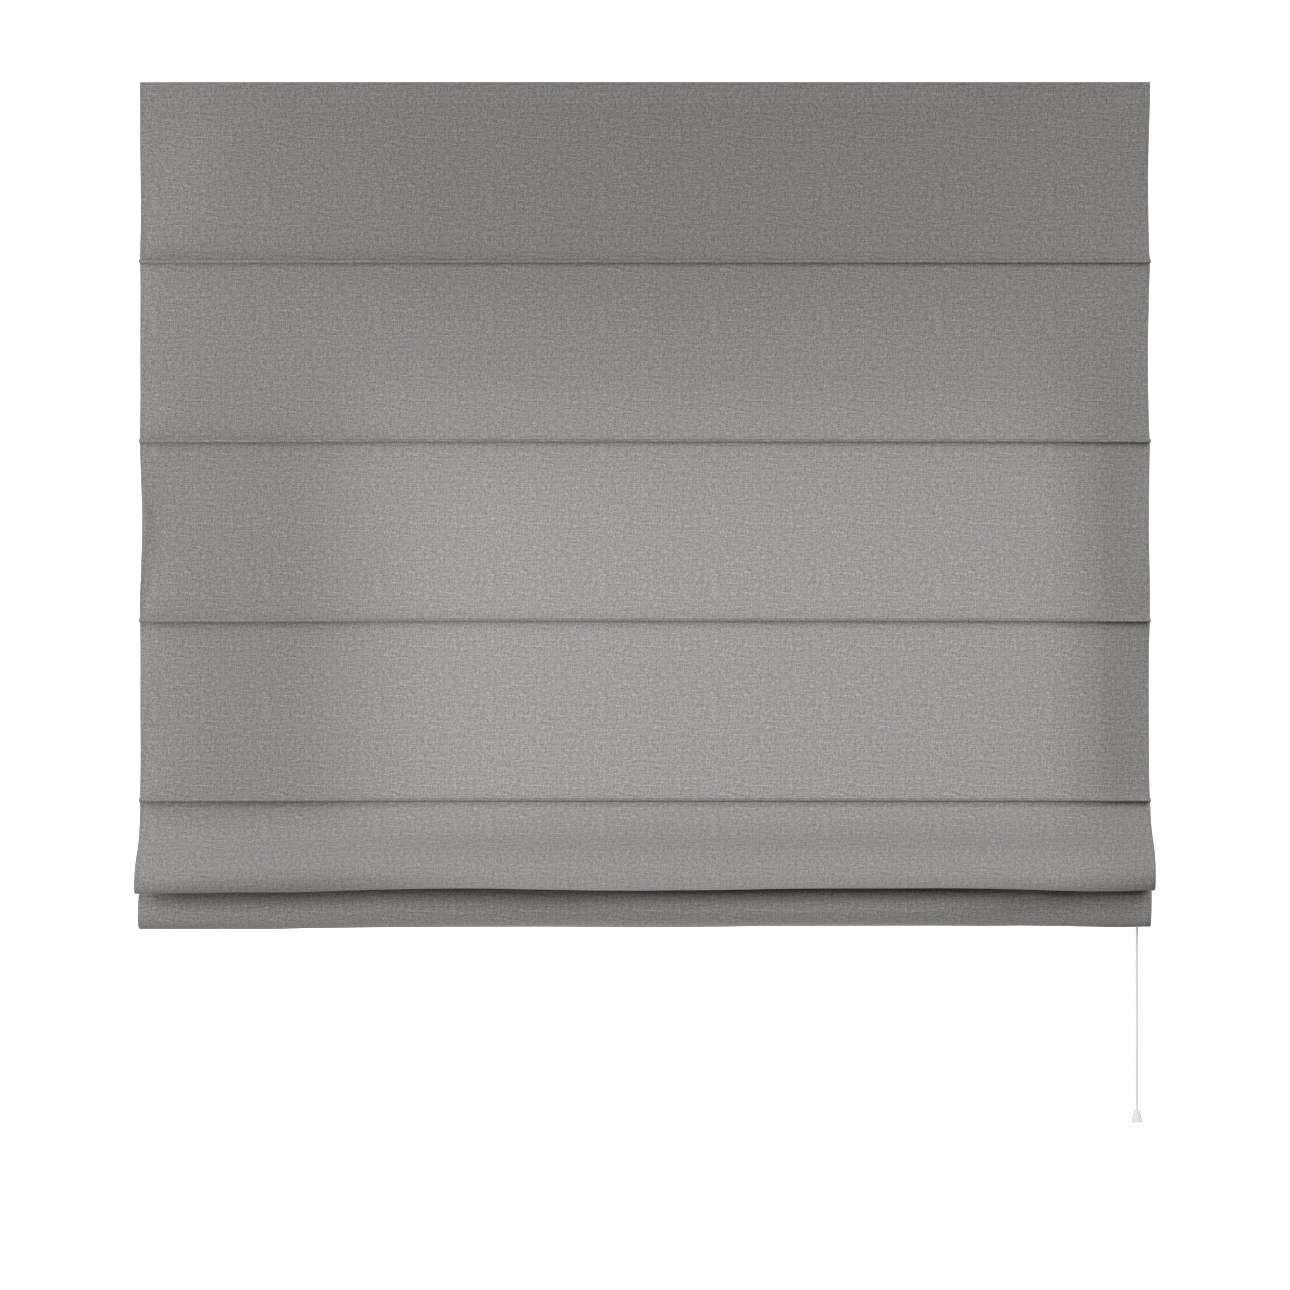 Romanetės Capri 80 x 170 cm (plotis x ilgis) kolekcijoje Edinburgh , audinys: 115-81